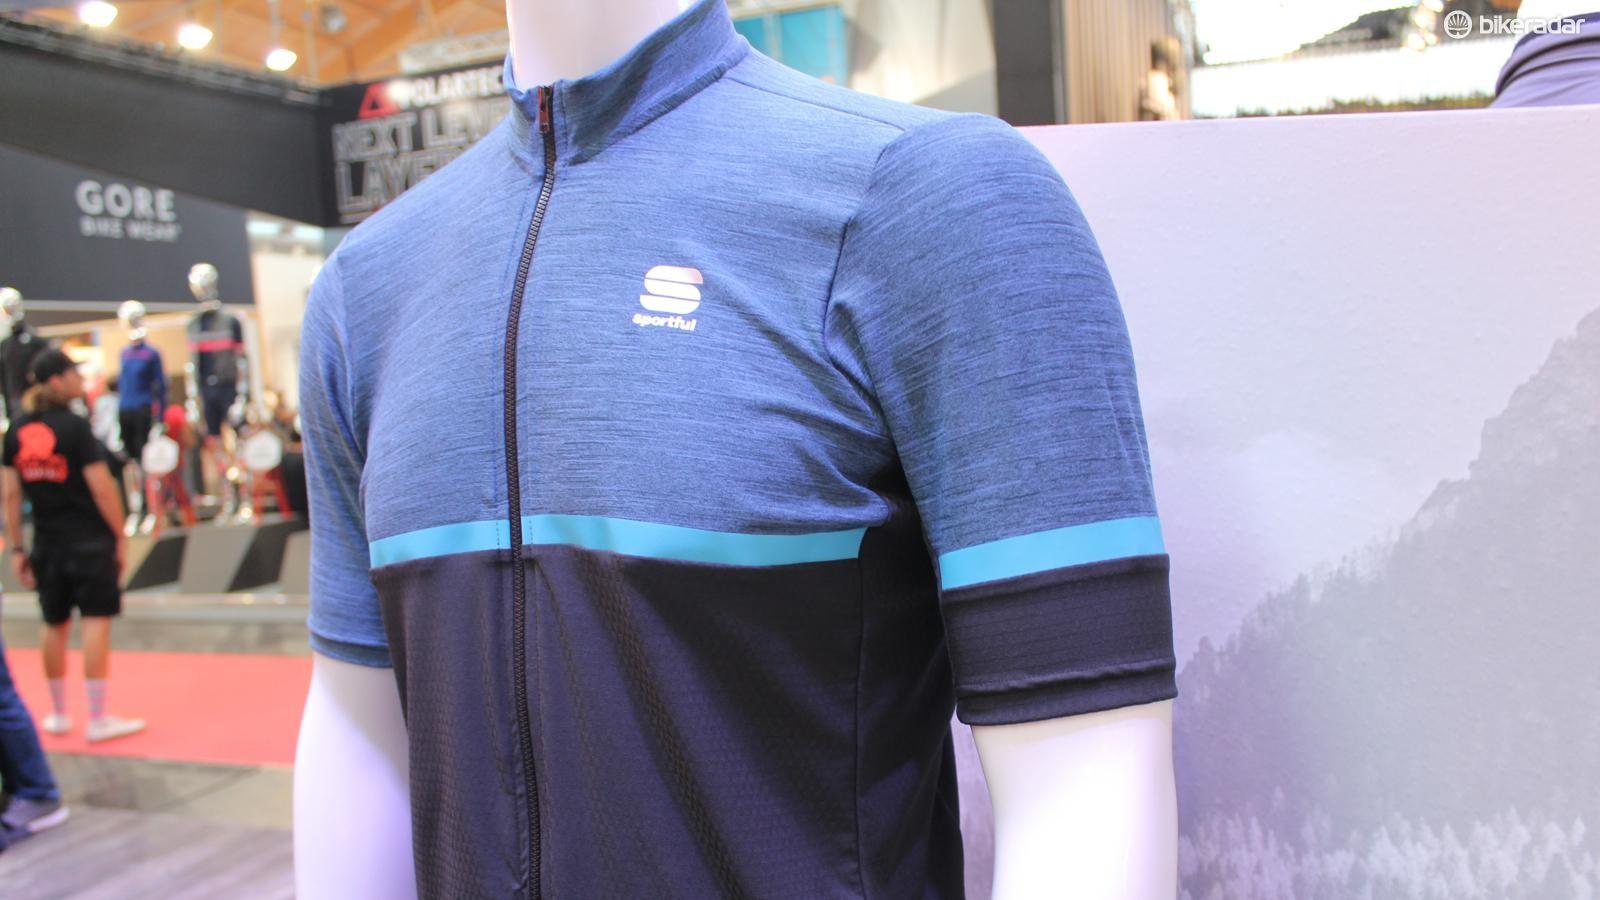 Sportful's gravel jersey, the Giara